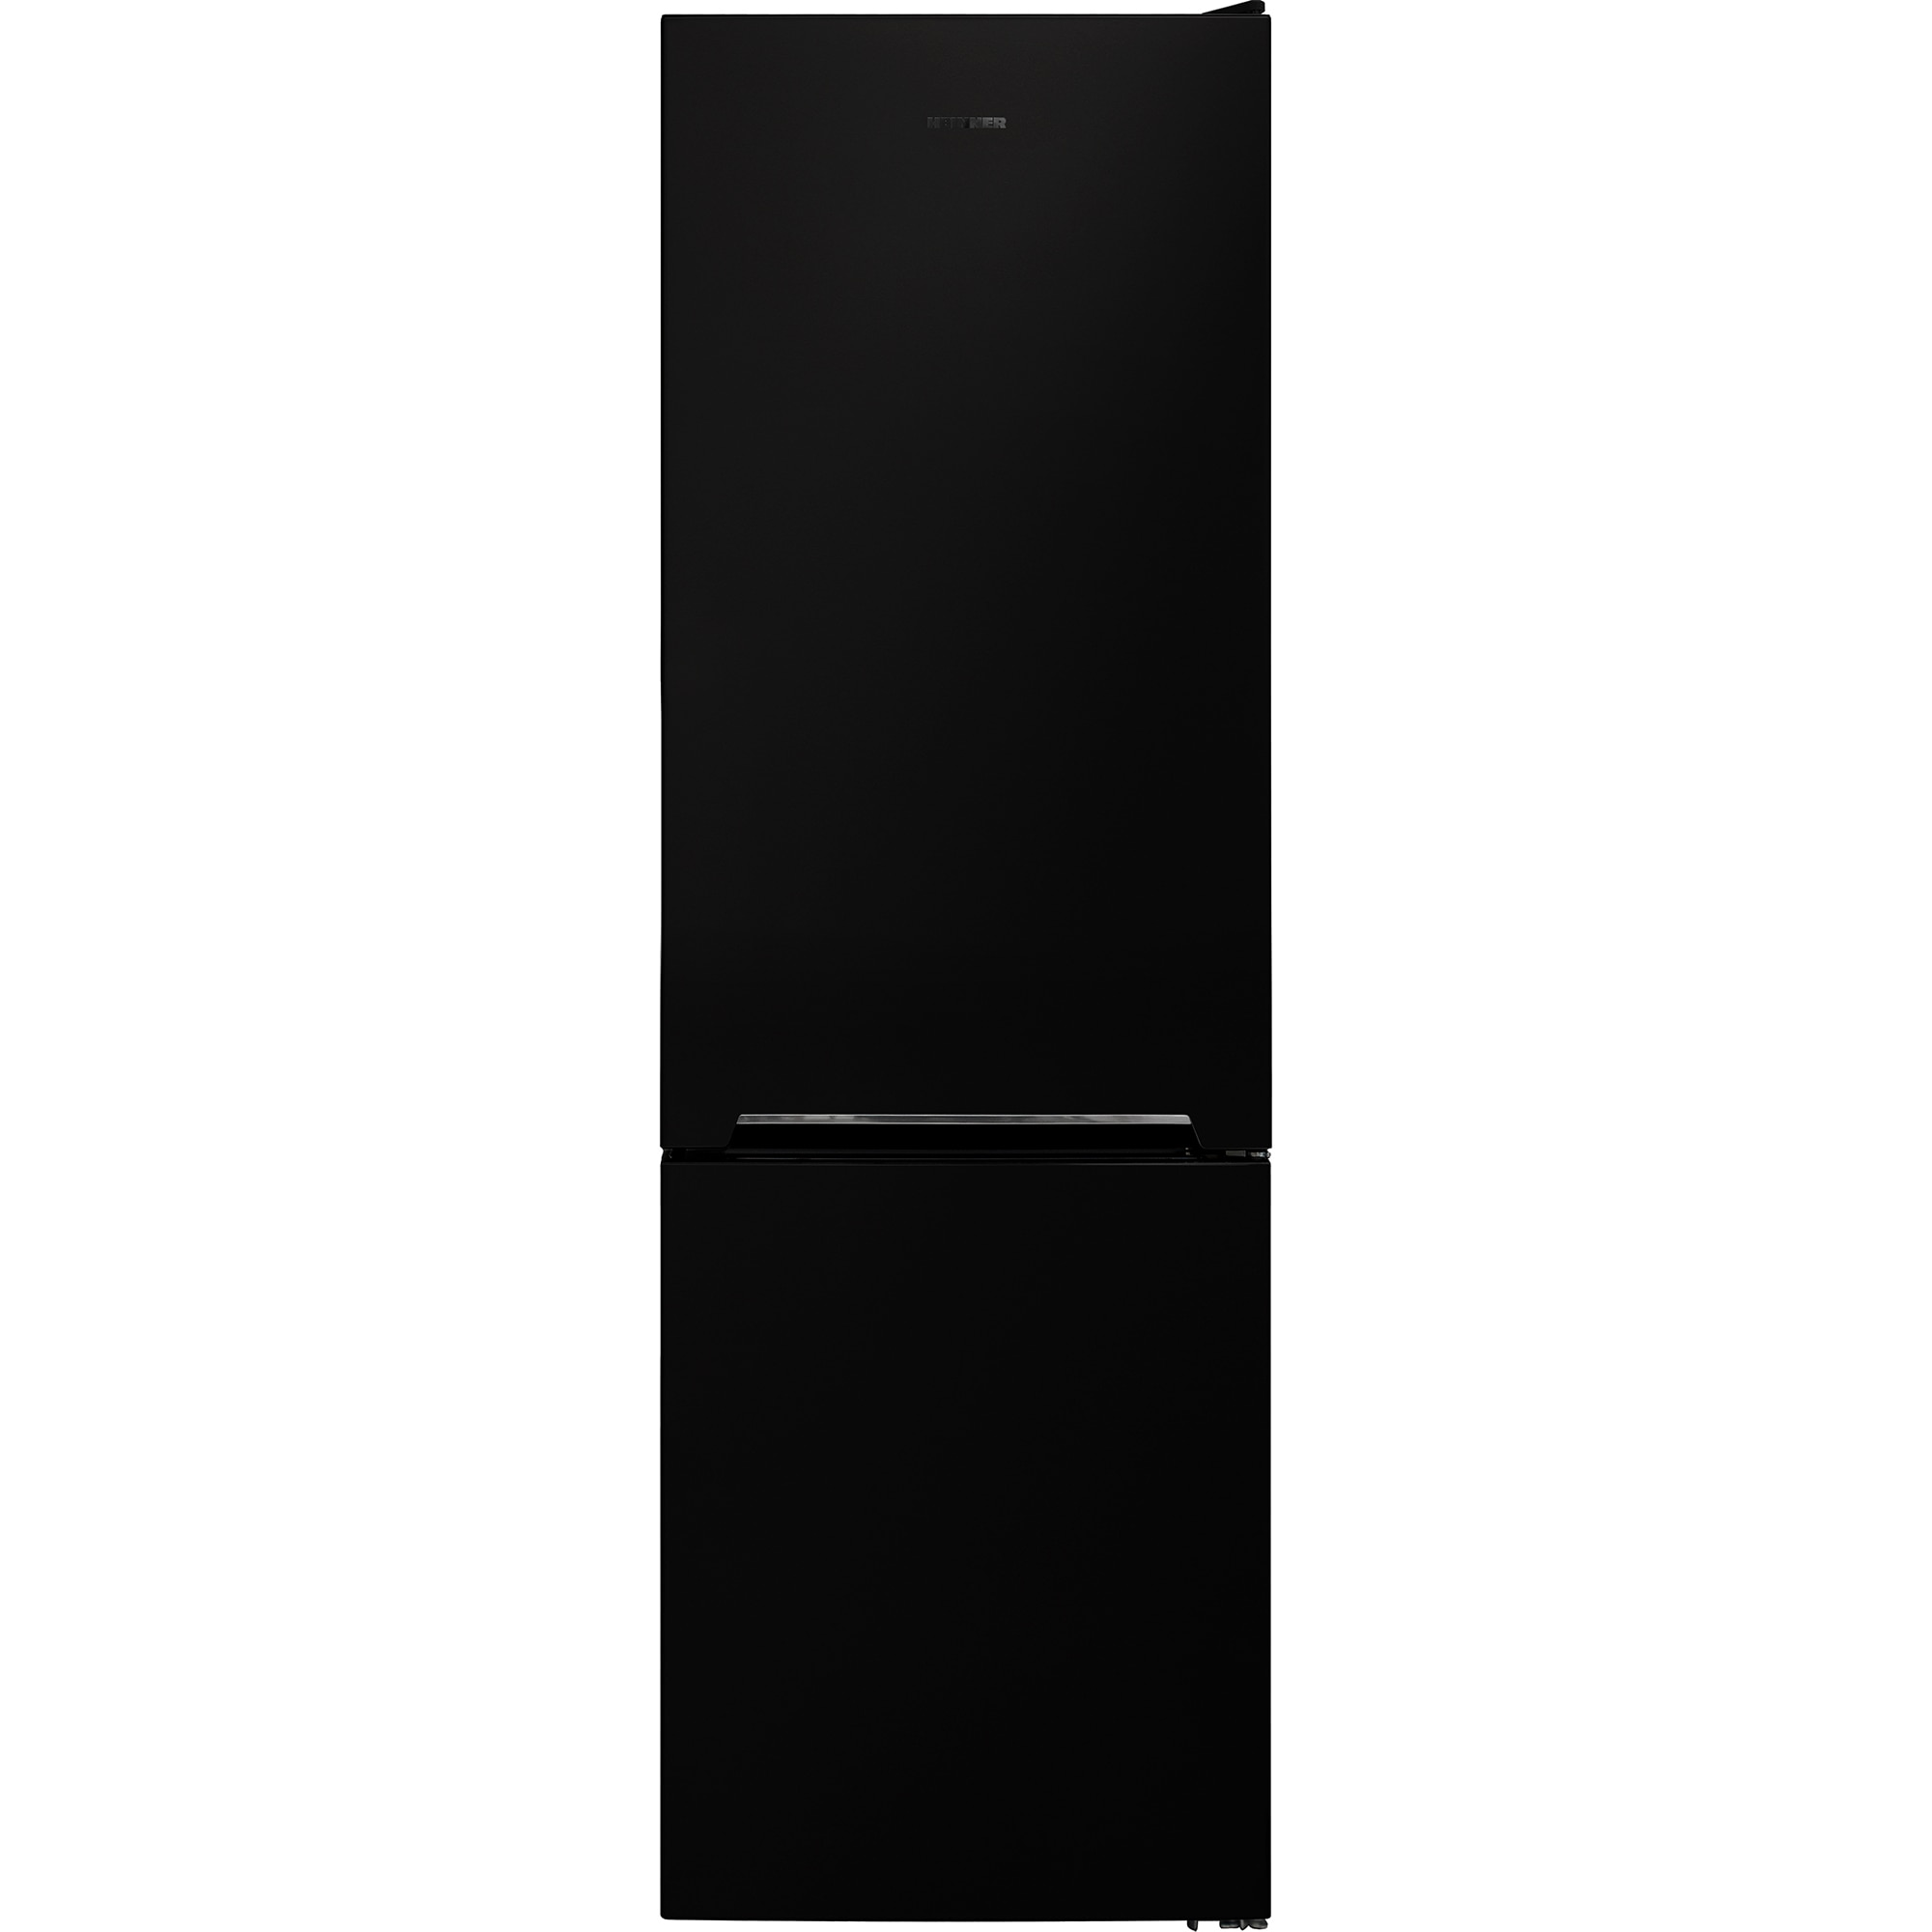 Fotografie Combina frigorifica Heinner HC-V268BKF+, 268 l, Clasa F, Iluminare LED, Control mecanic, Termostat ajustabil, H 170 cm, Negru